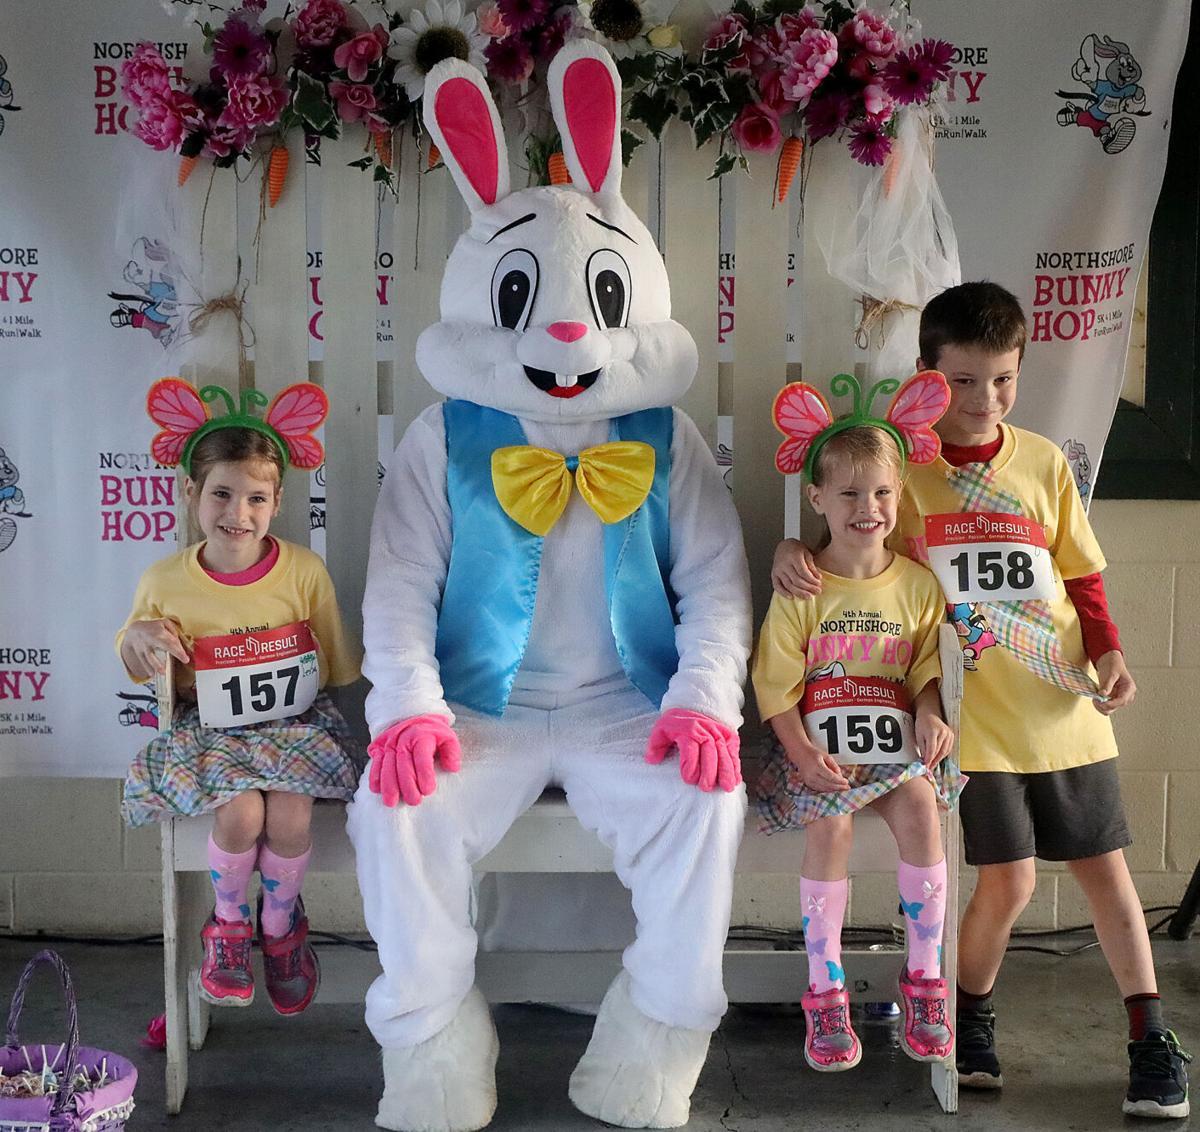 bunnyhop.tam.033121.01.jpg (copy)